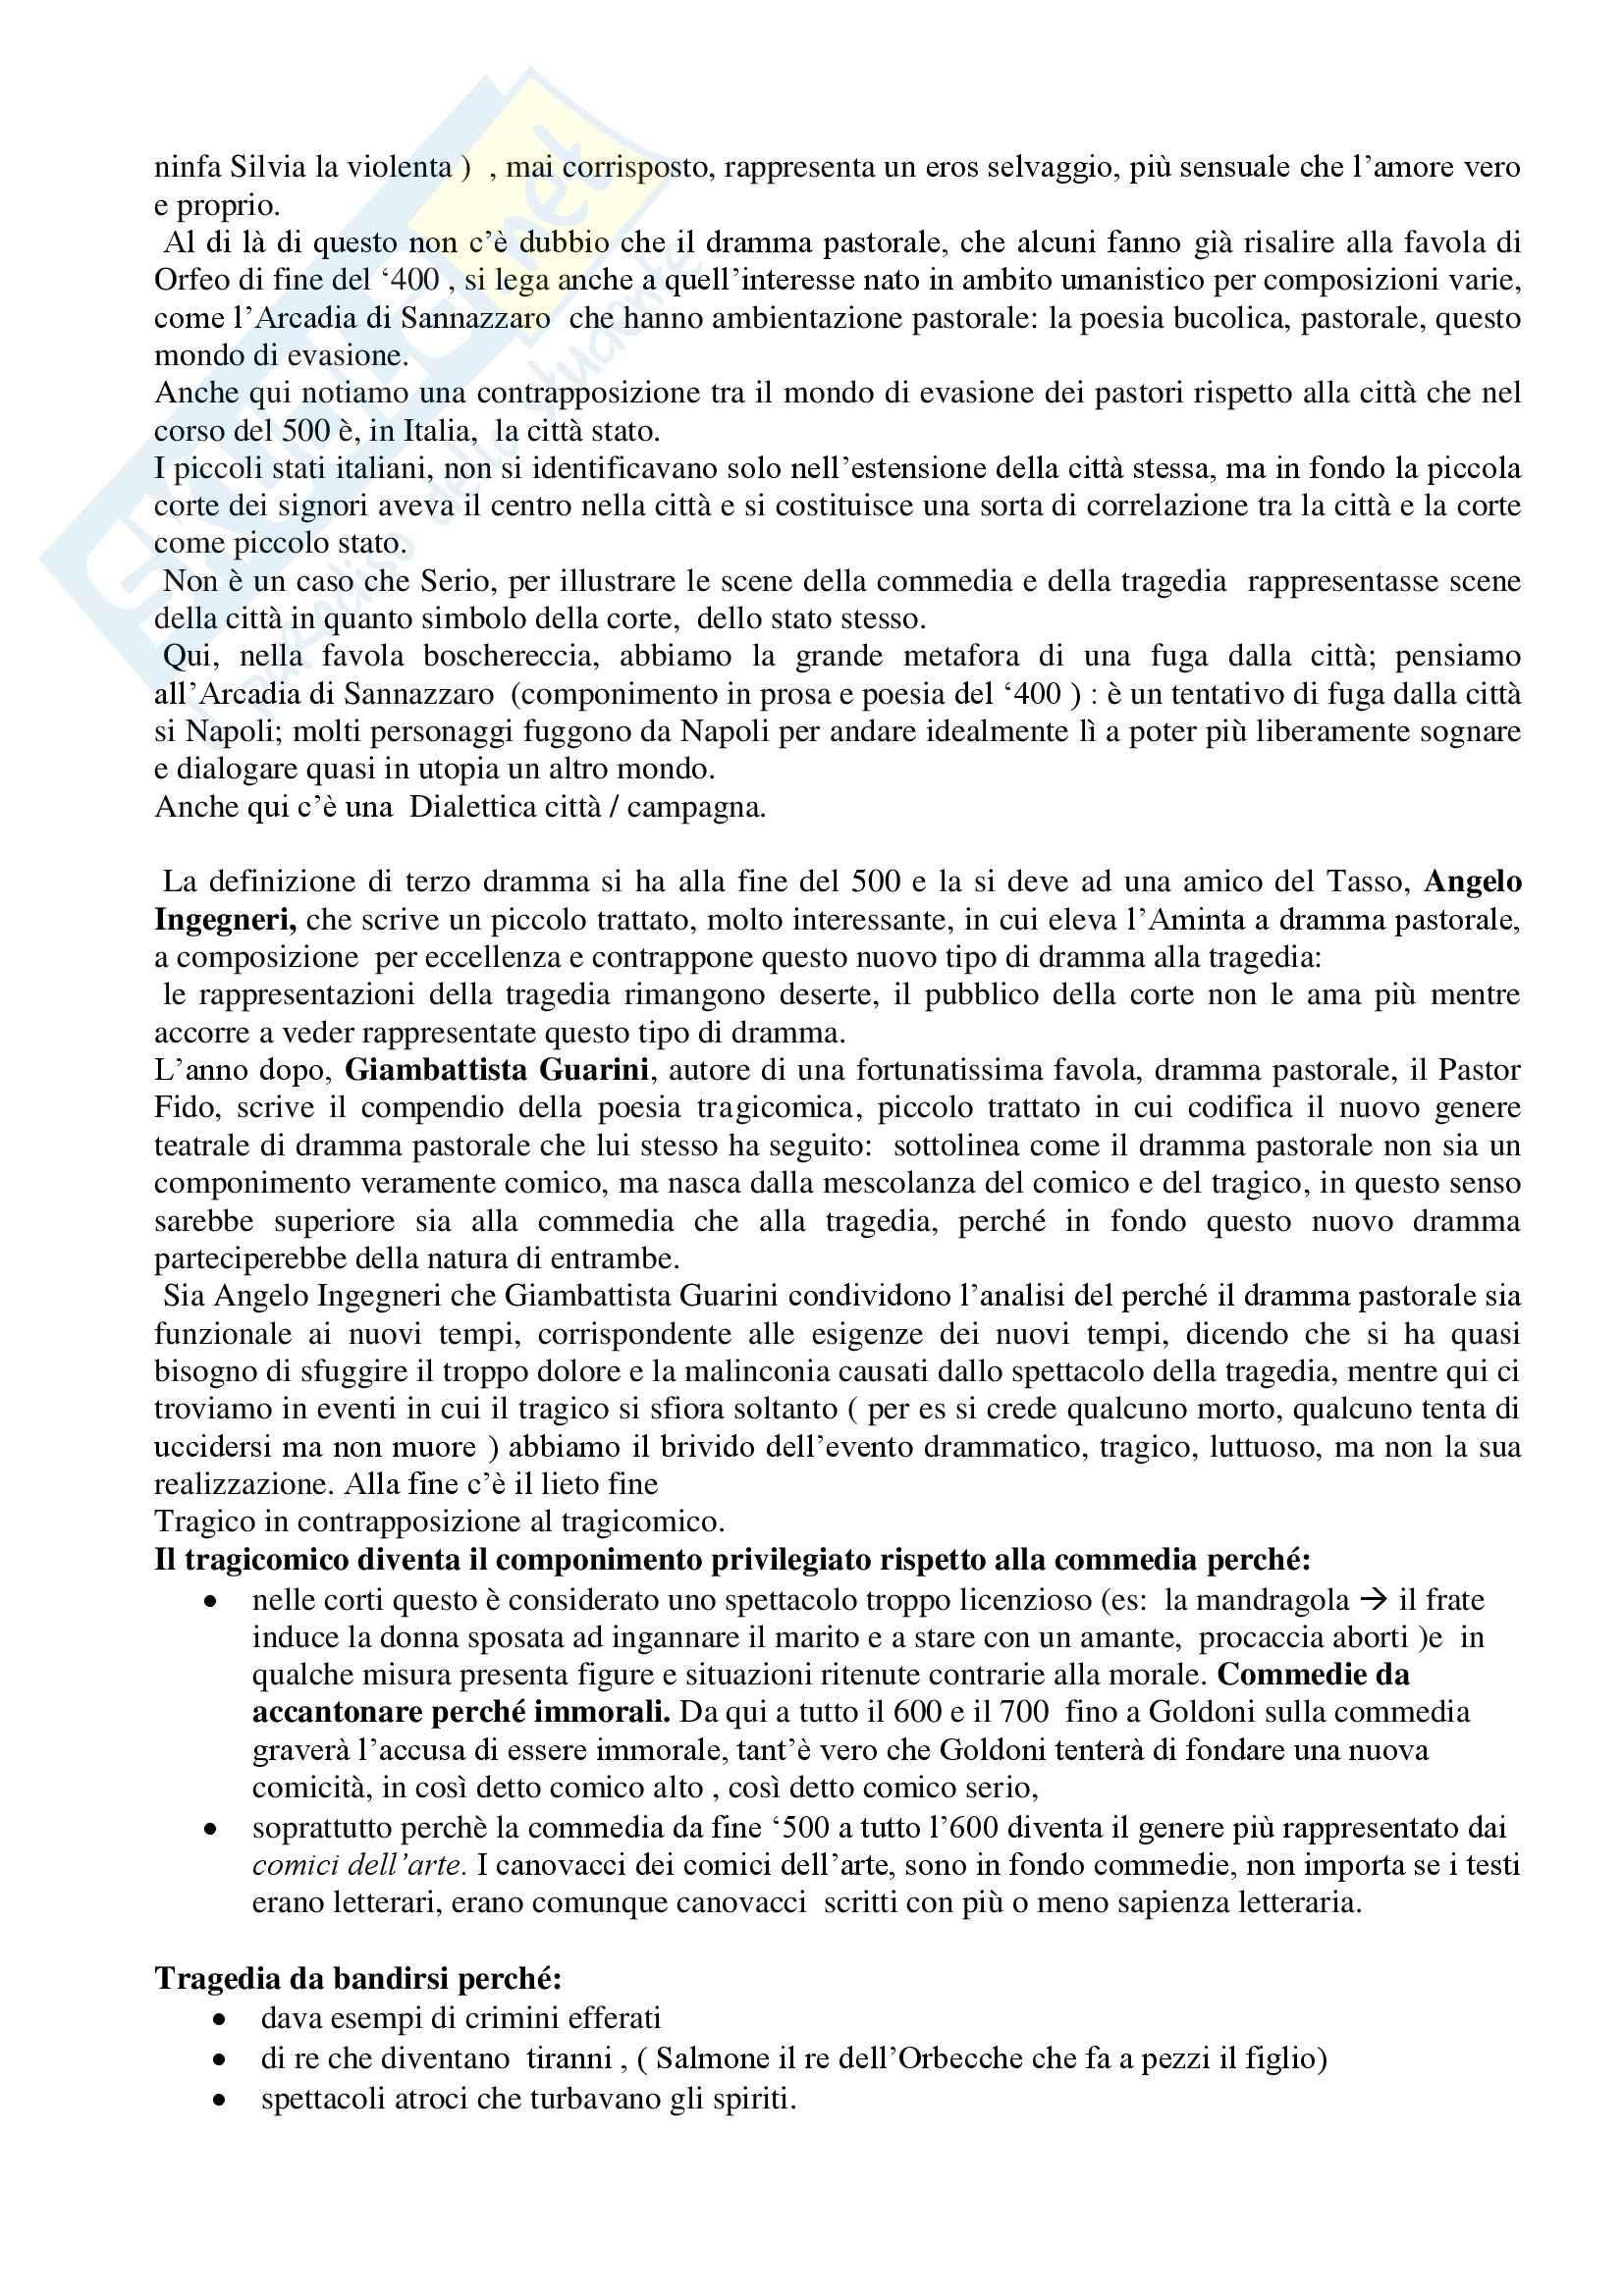 Letteratura teatrale italiana - Aminta Pag. 2